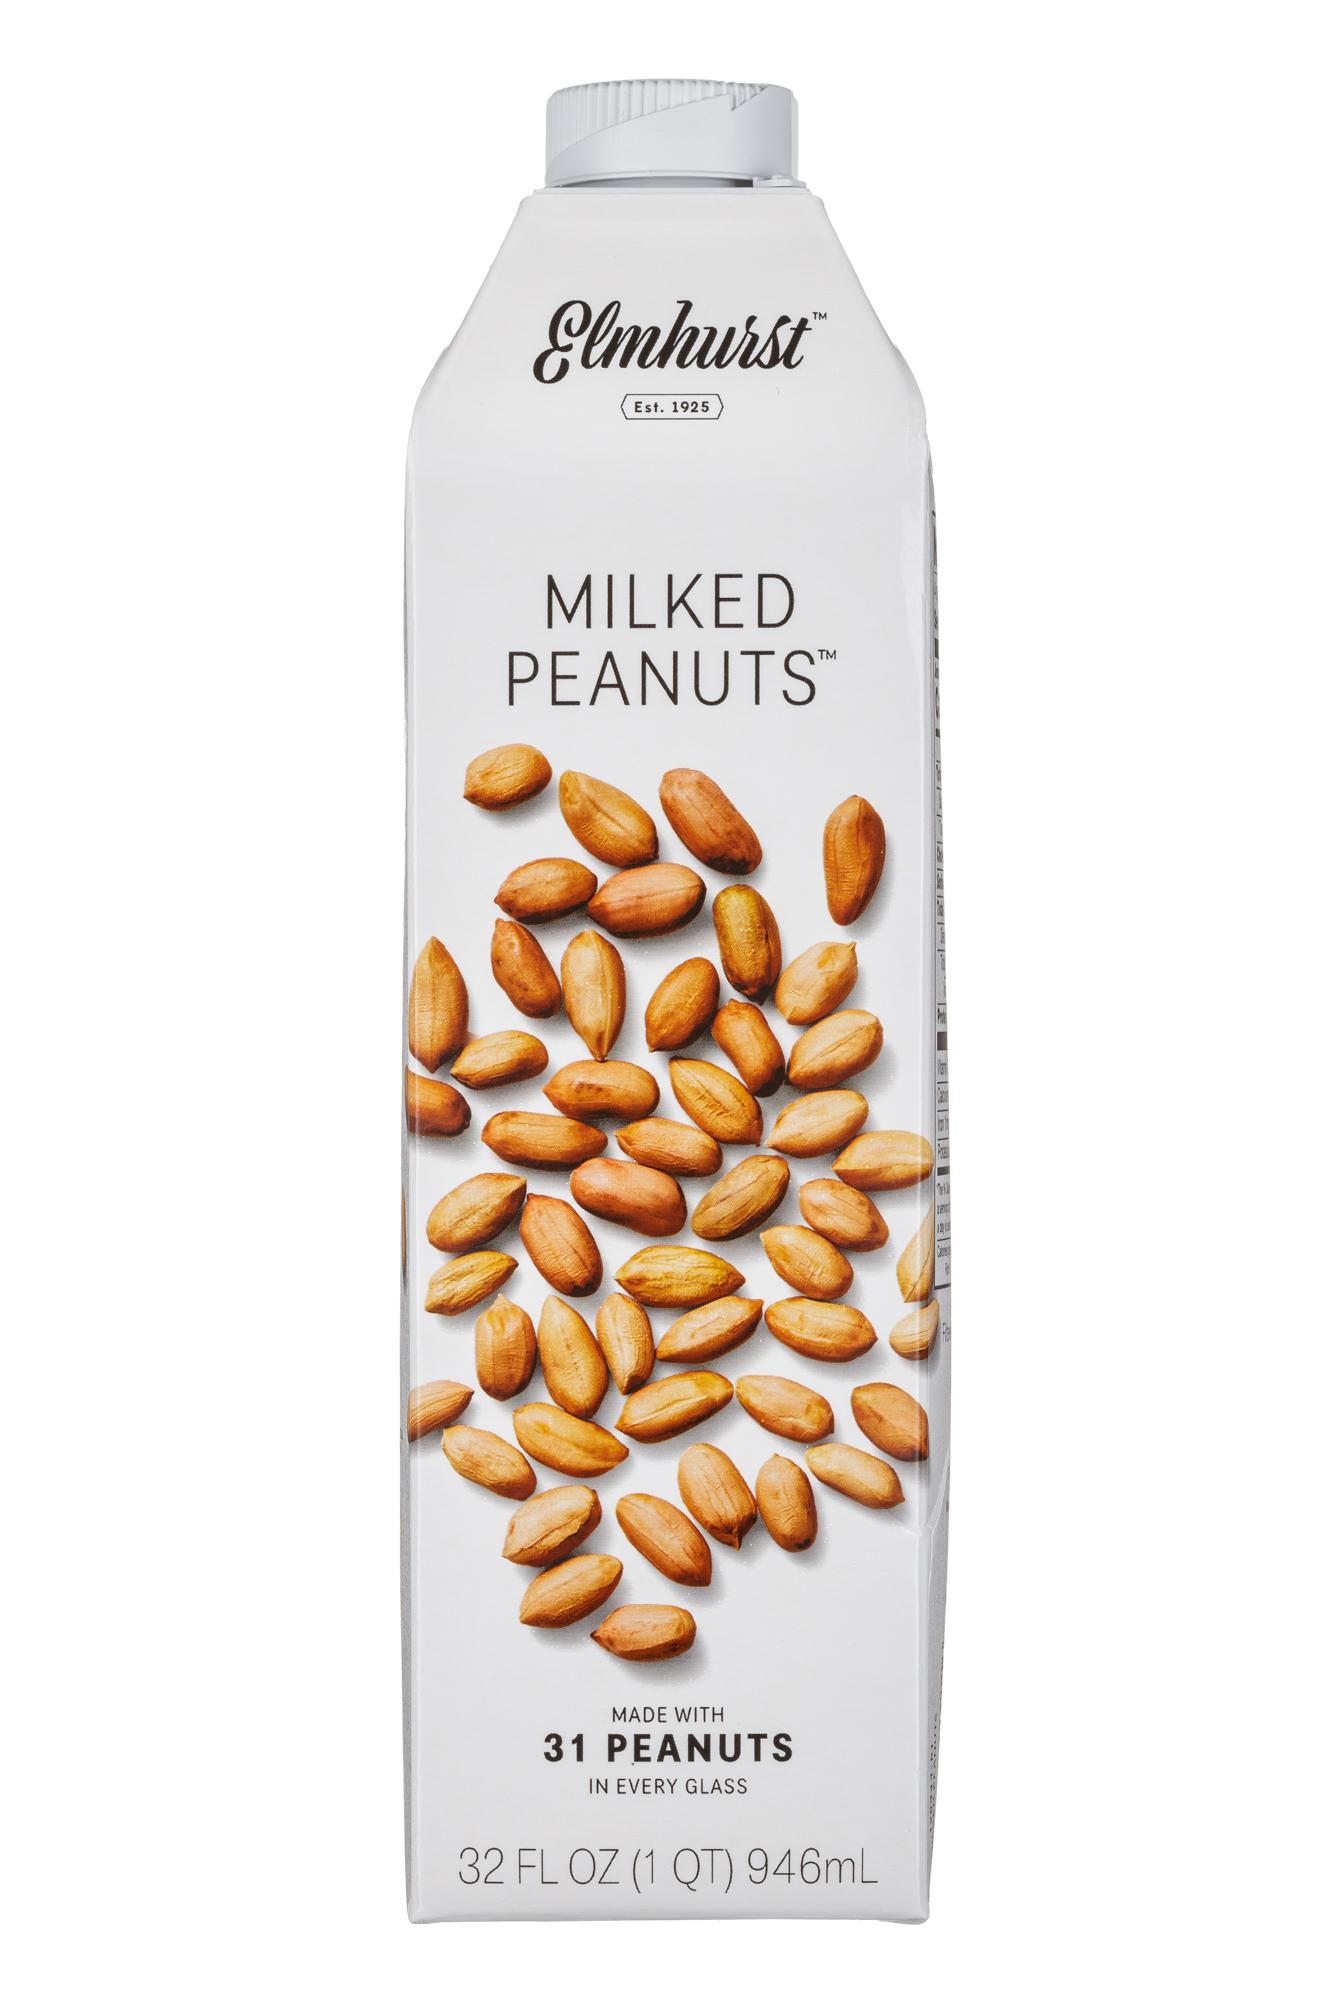 Elmhurst: Elmhurst-32oz-MilkedPeanuts-Front